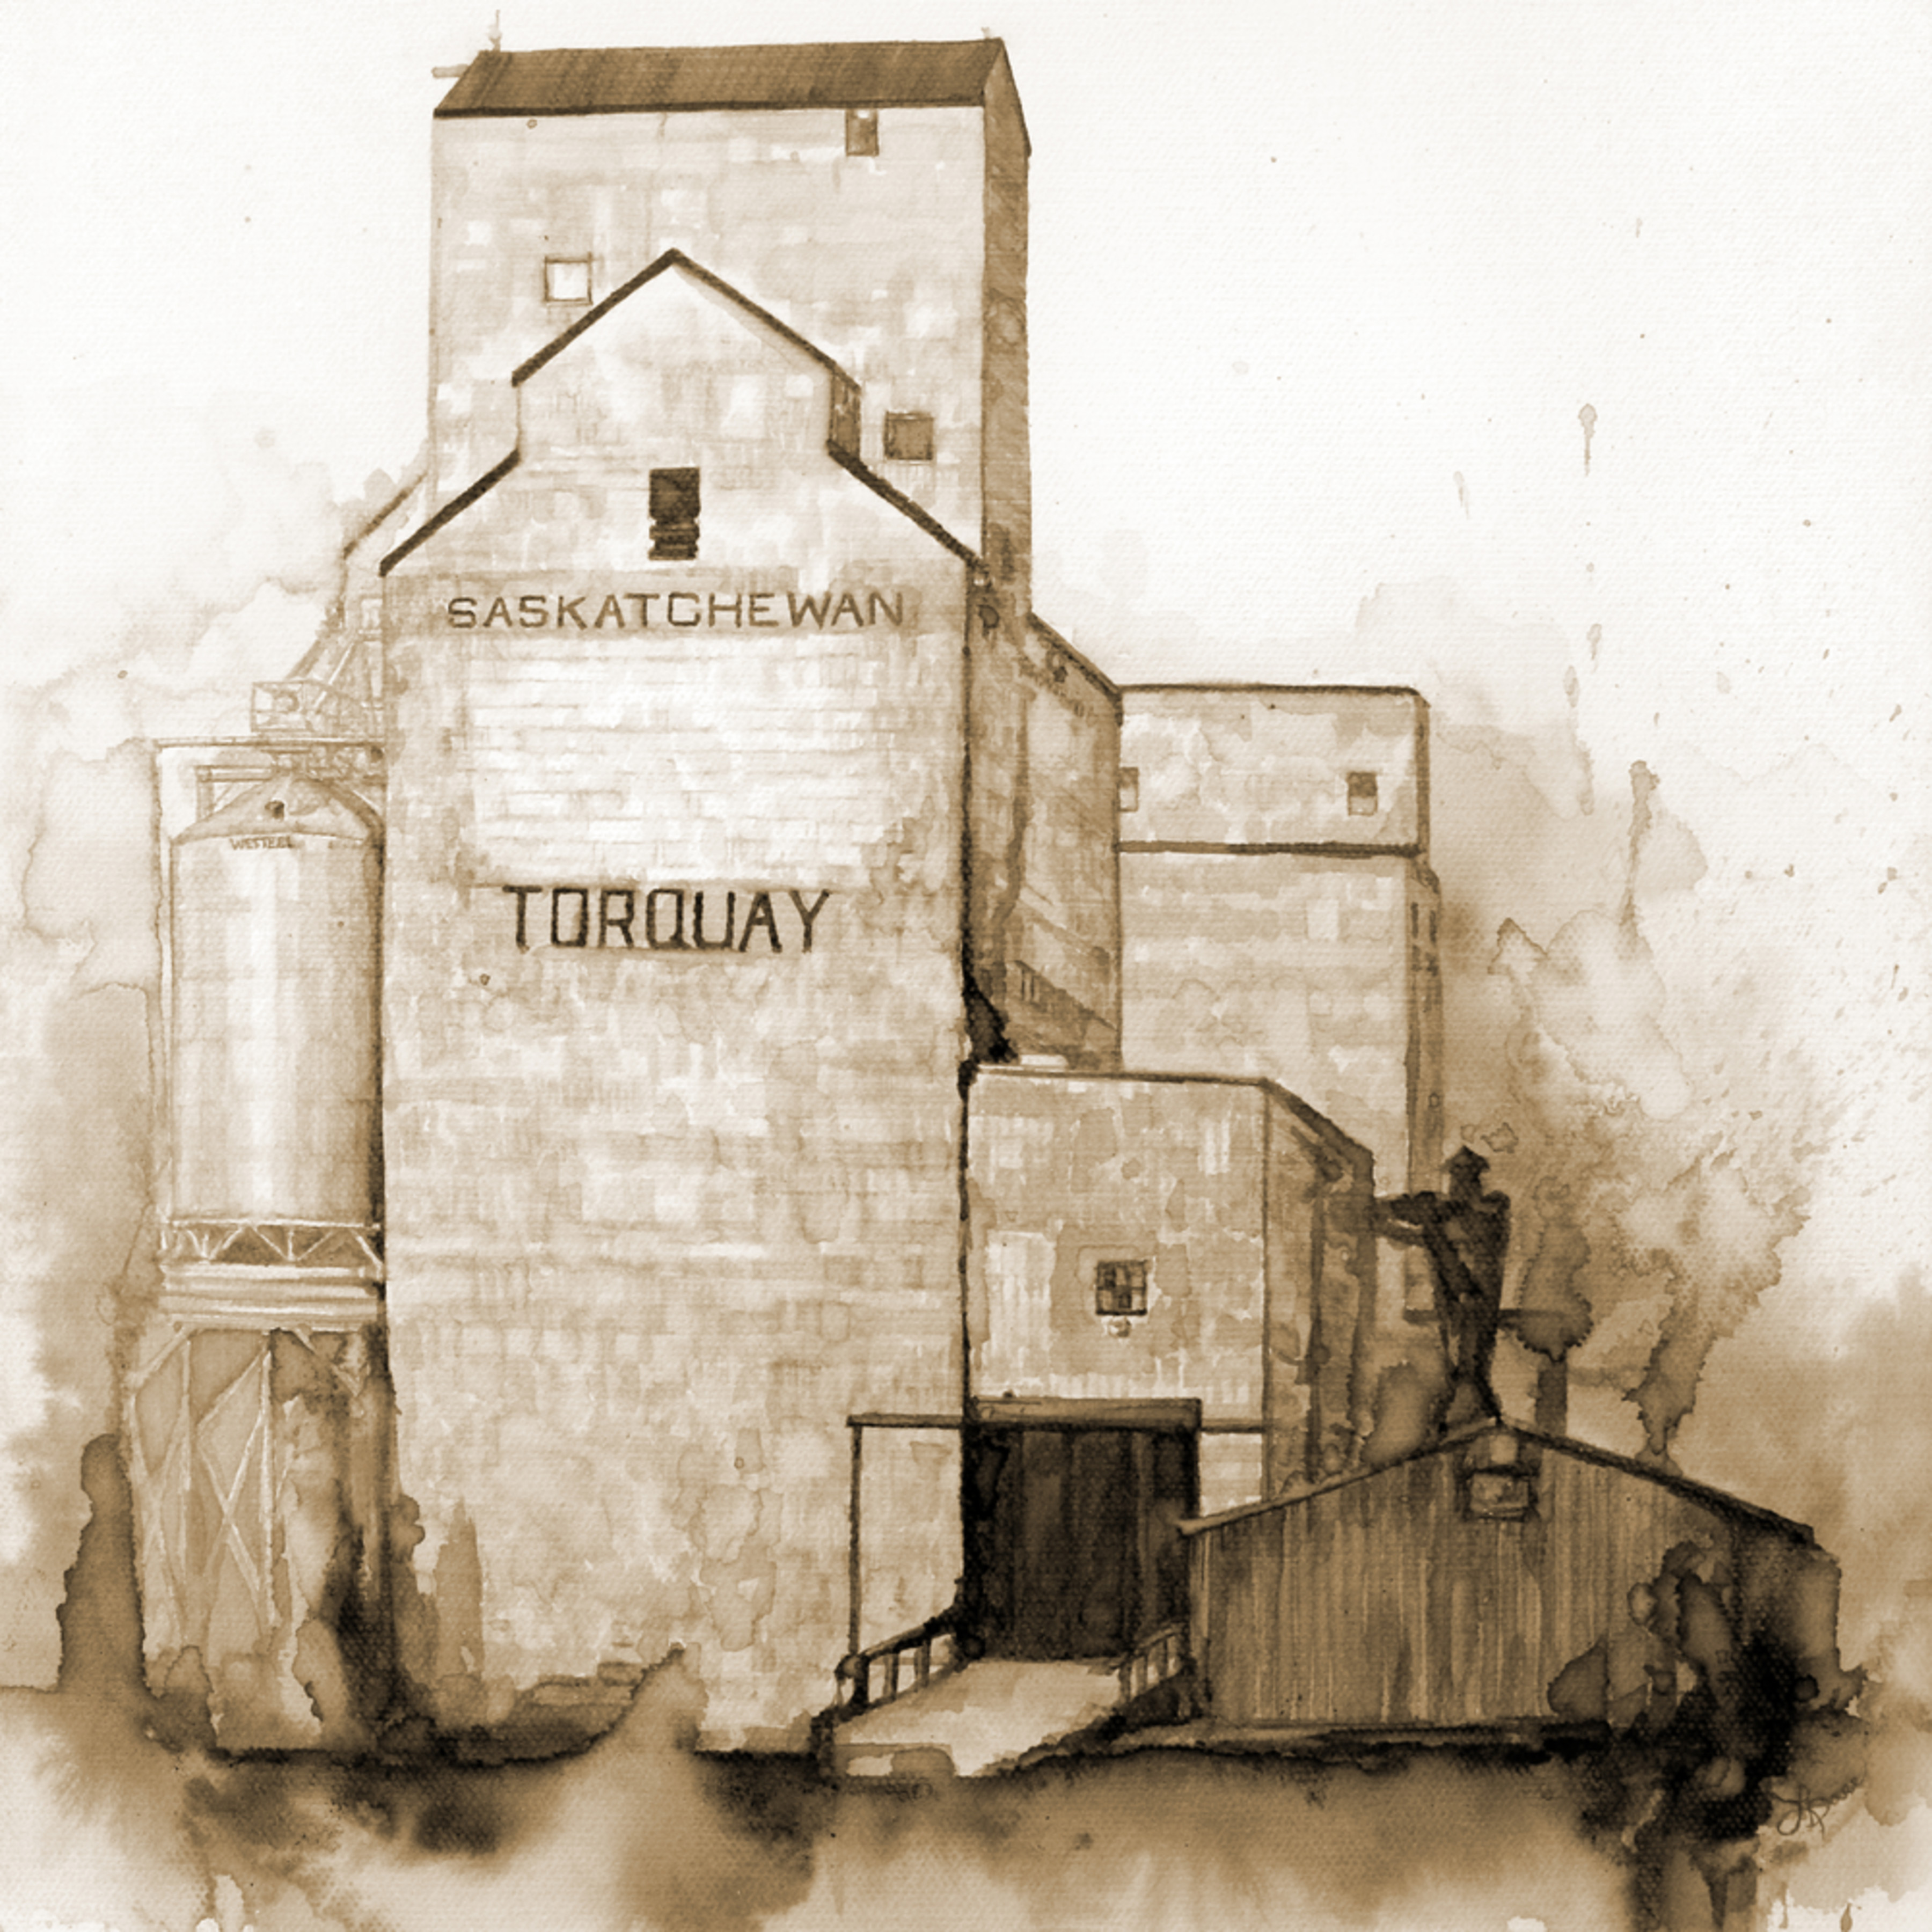 Torquay elevators 2019 i5j6jm